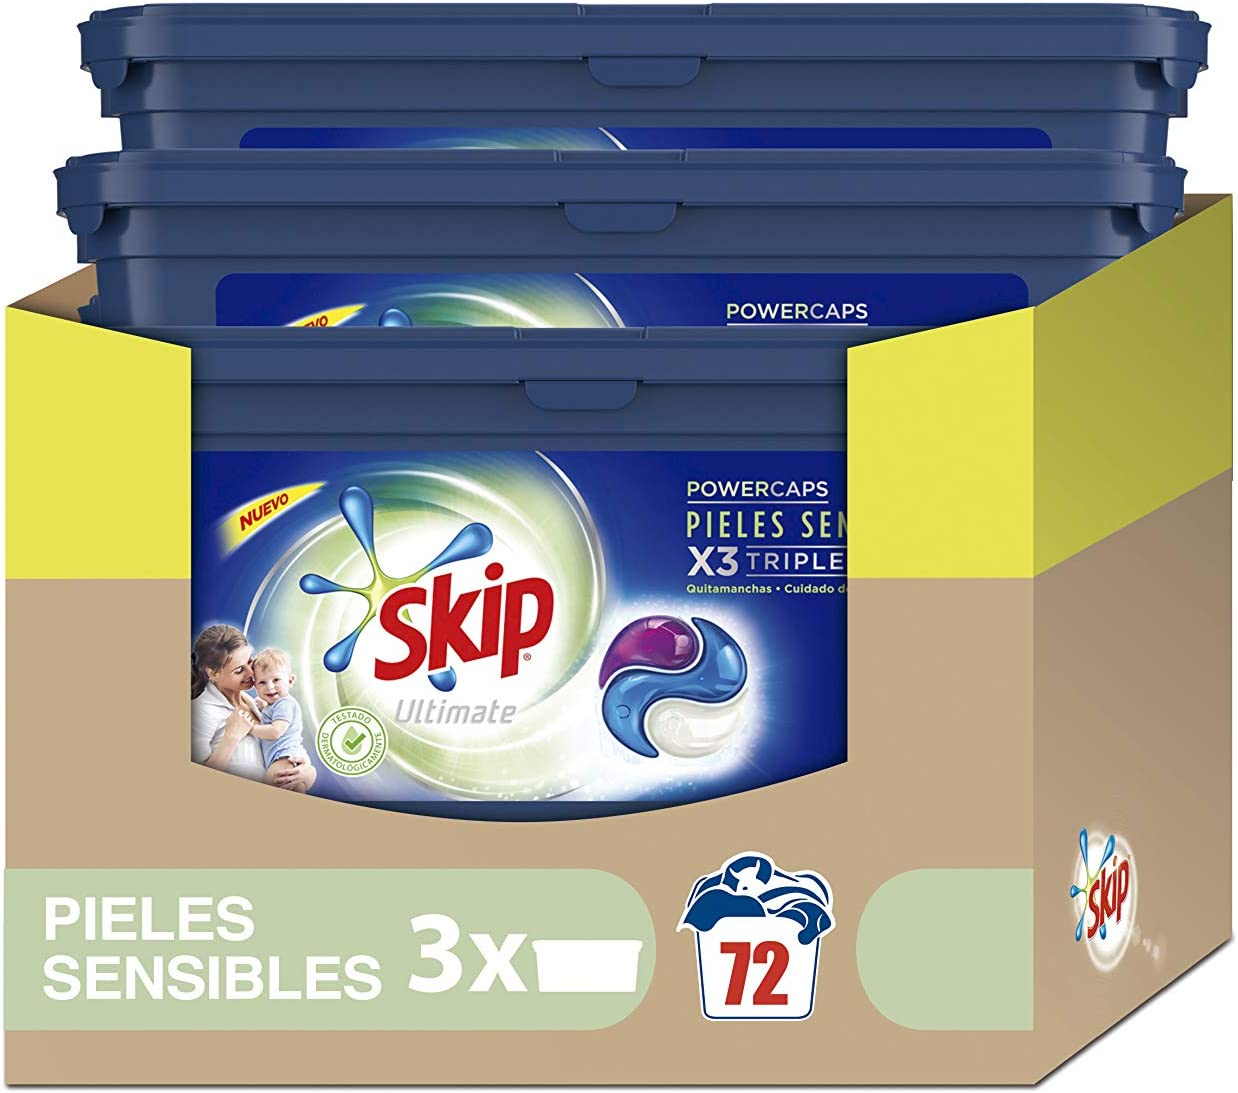 Skip Ultimate Triple Poder Pieles Sensibles Detergente Cápsulas para Lavadora - Paquete de 3 x 24 lavados - Total: 72 lavados